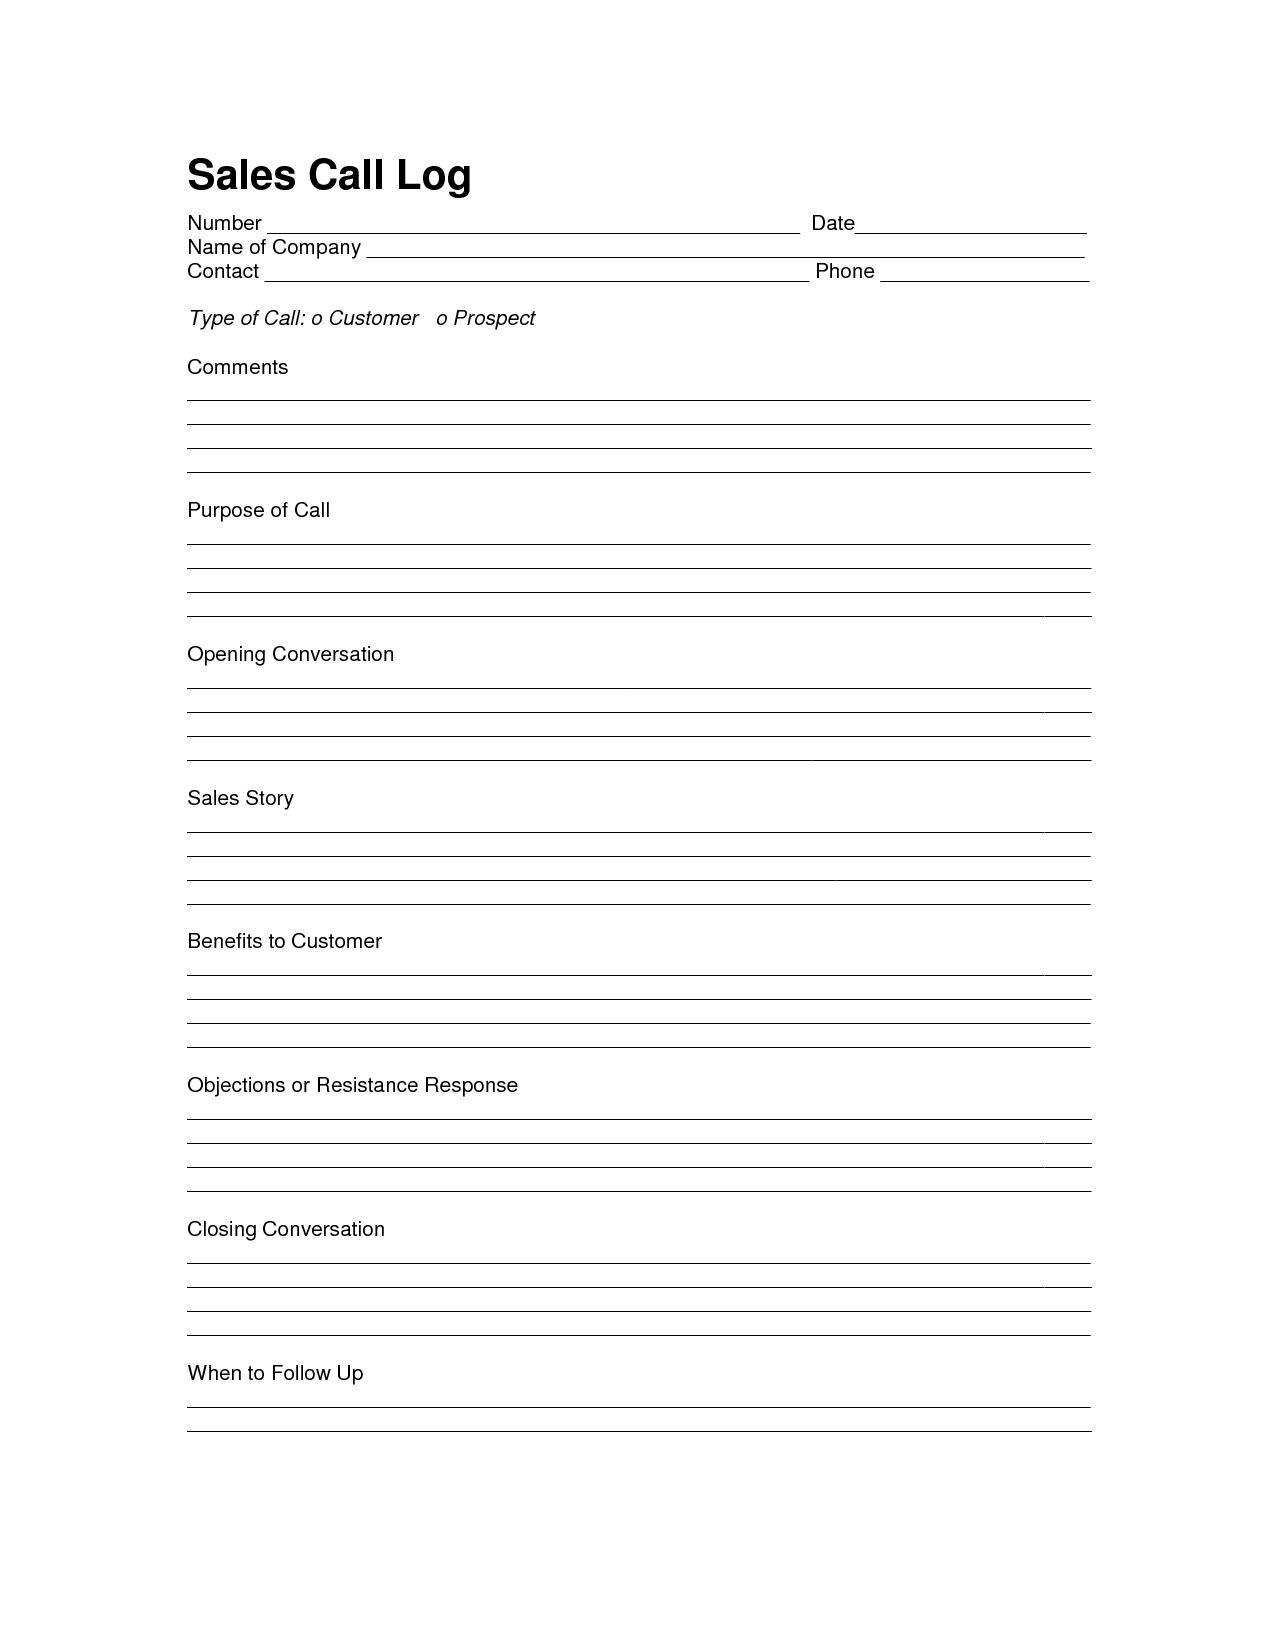 Sales Log Sheet Template | Sales Call Log Template | Call Log - Free Printable Message Sheets